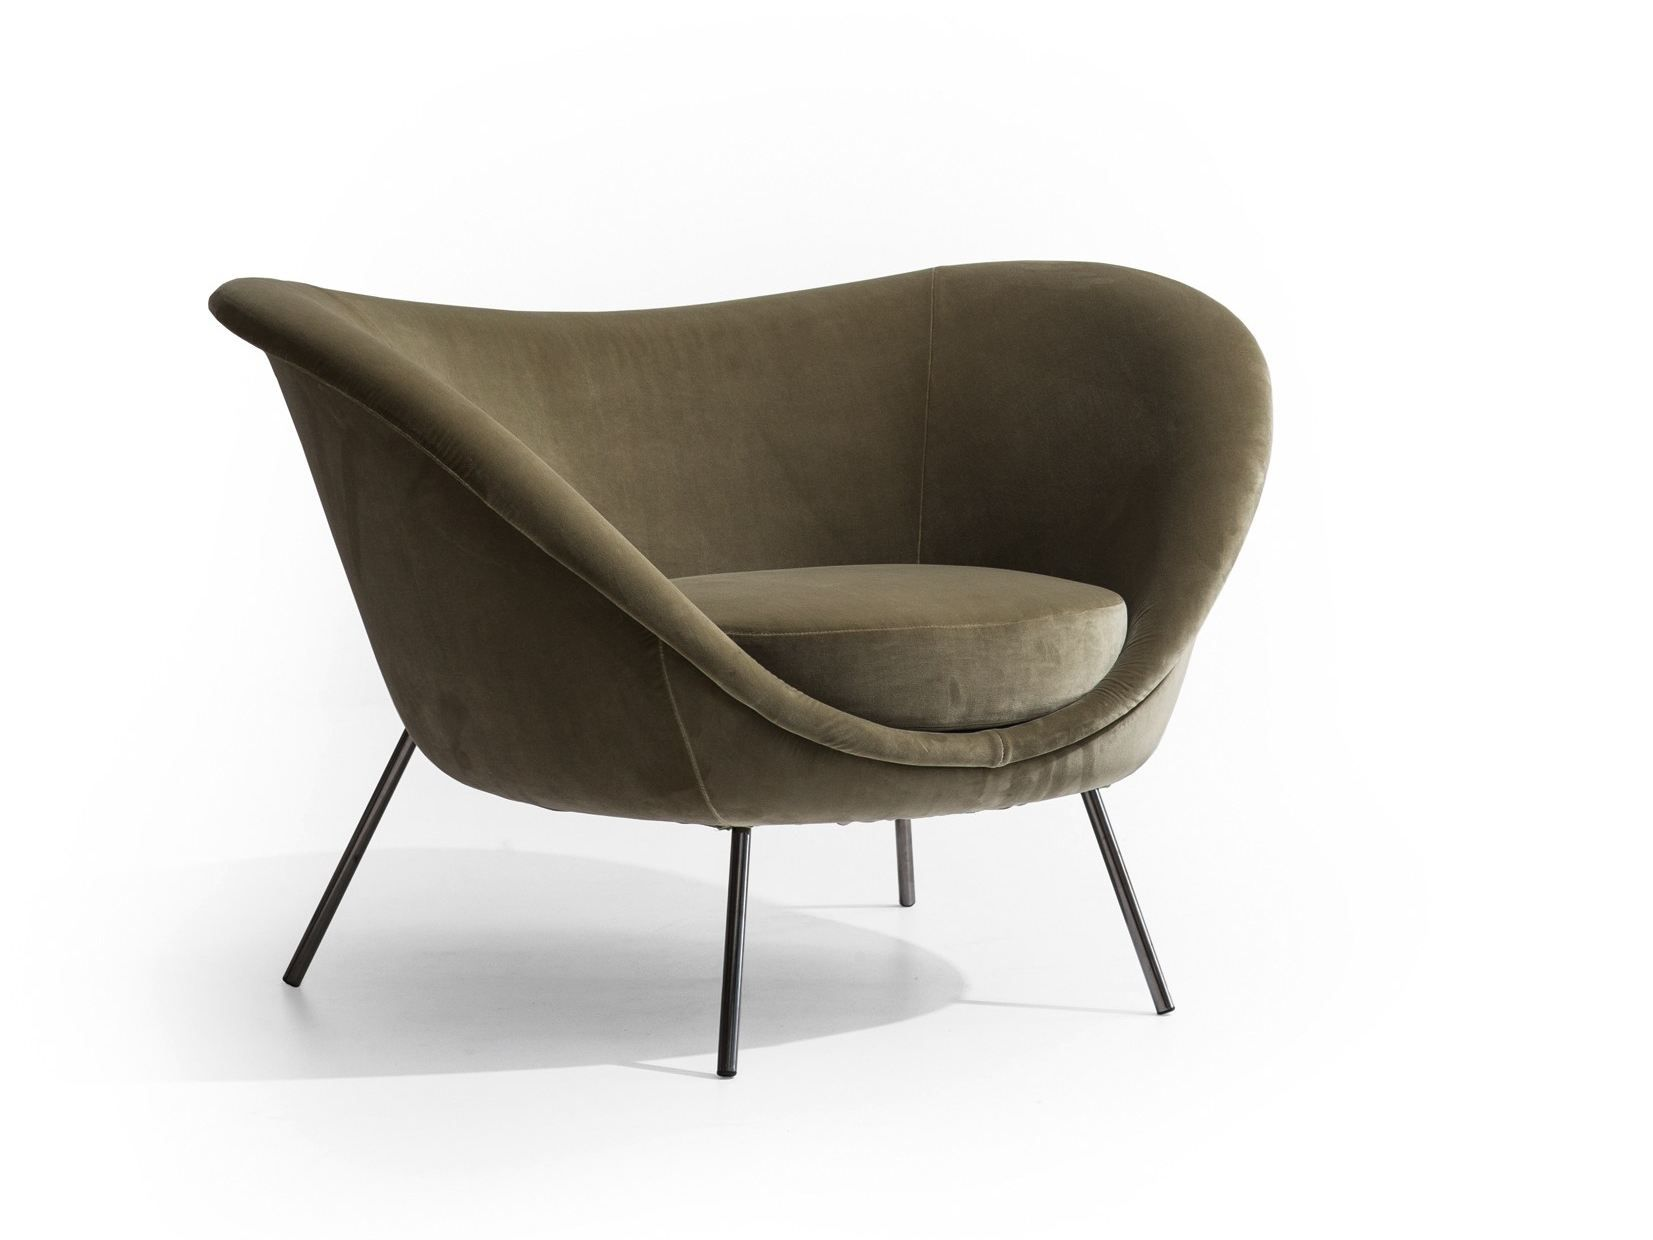 Ohrensessel designklassiker  D.154.2 Sessel by MOLTENI & C. Design Gio Ponti   Furniture ...